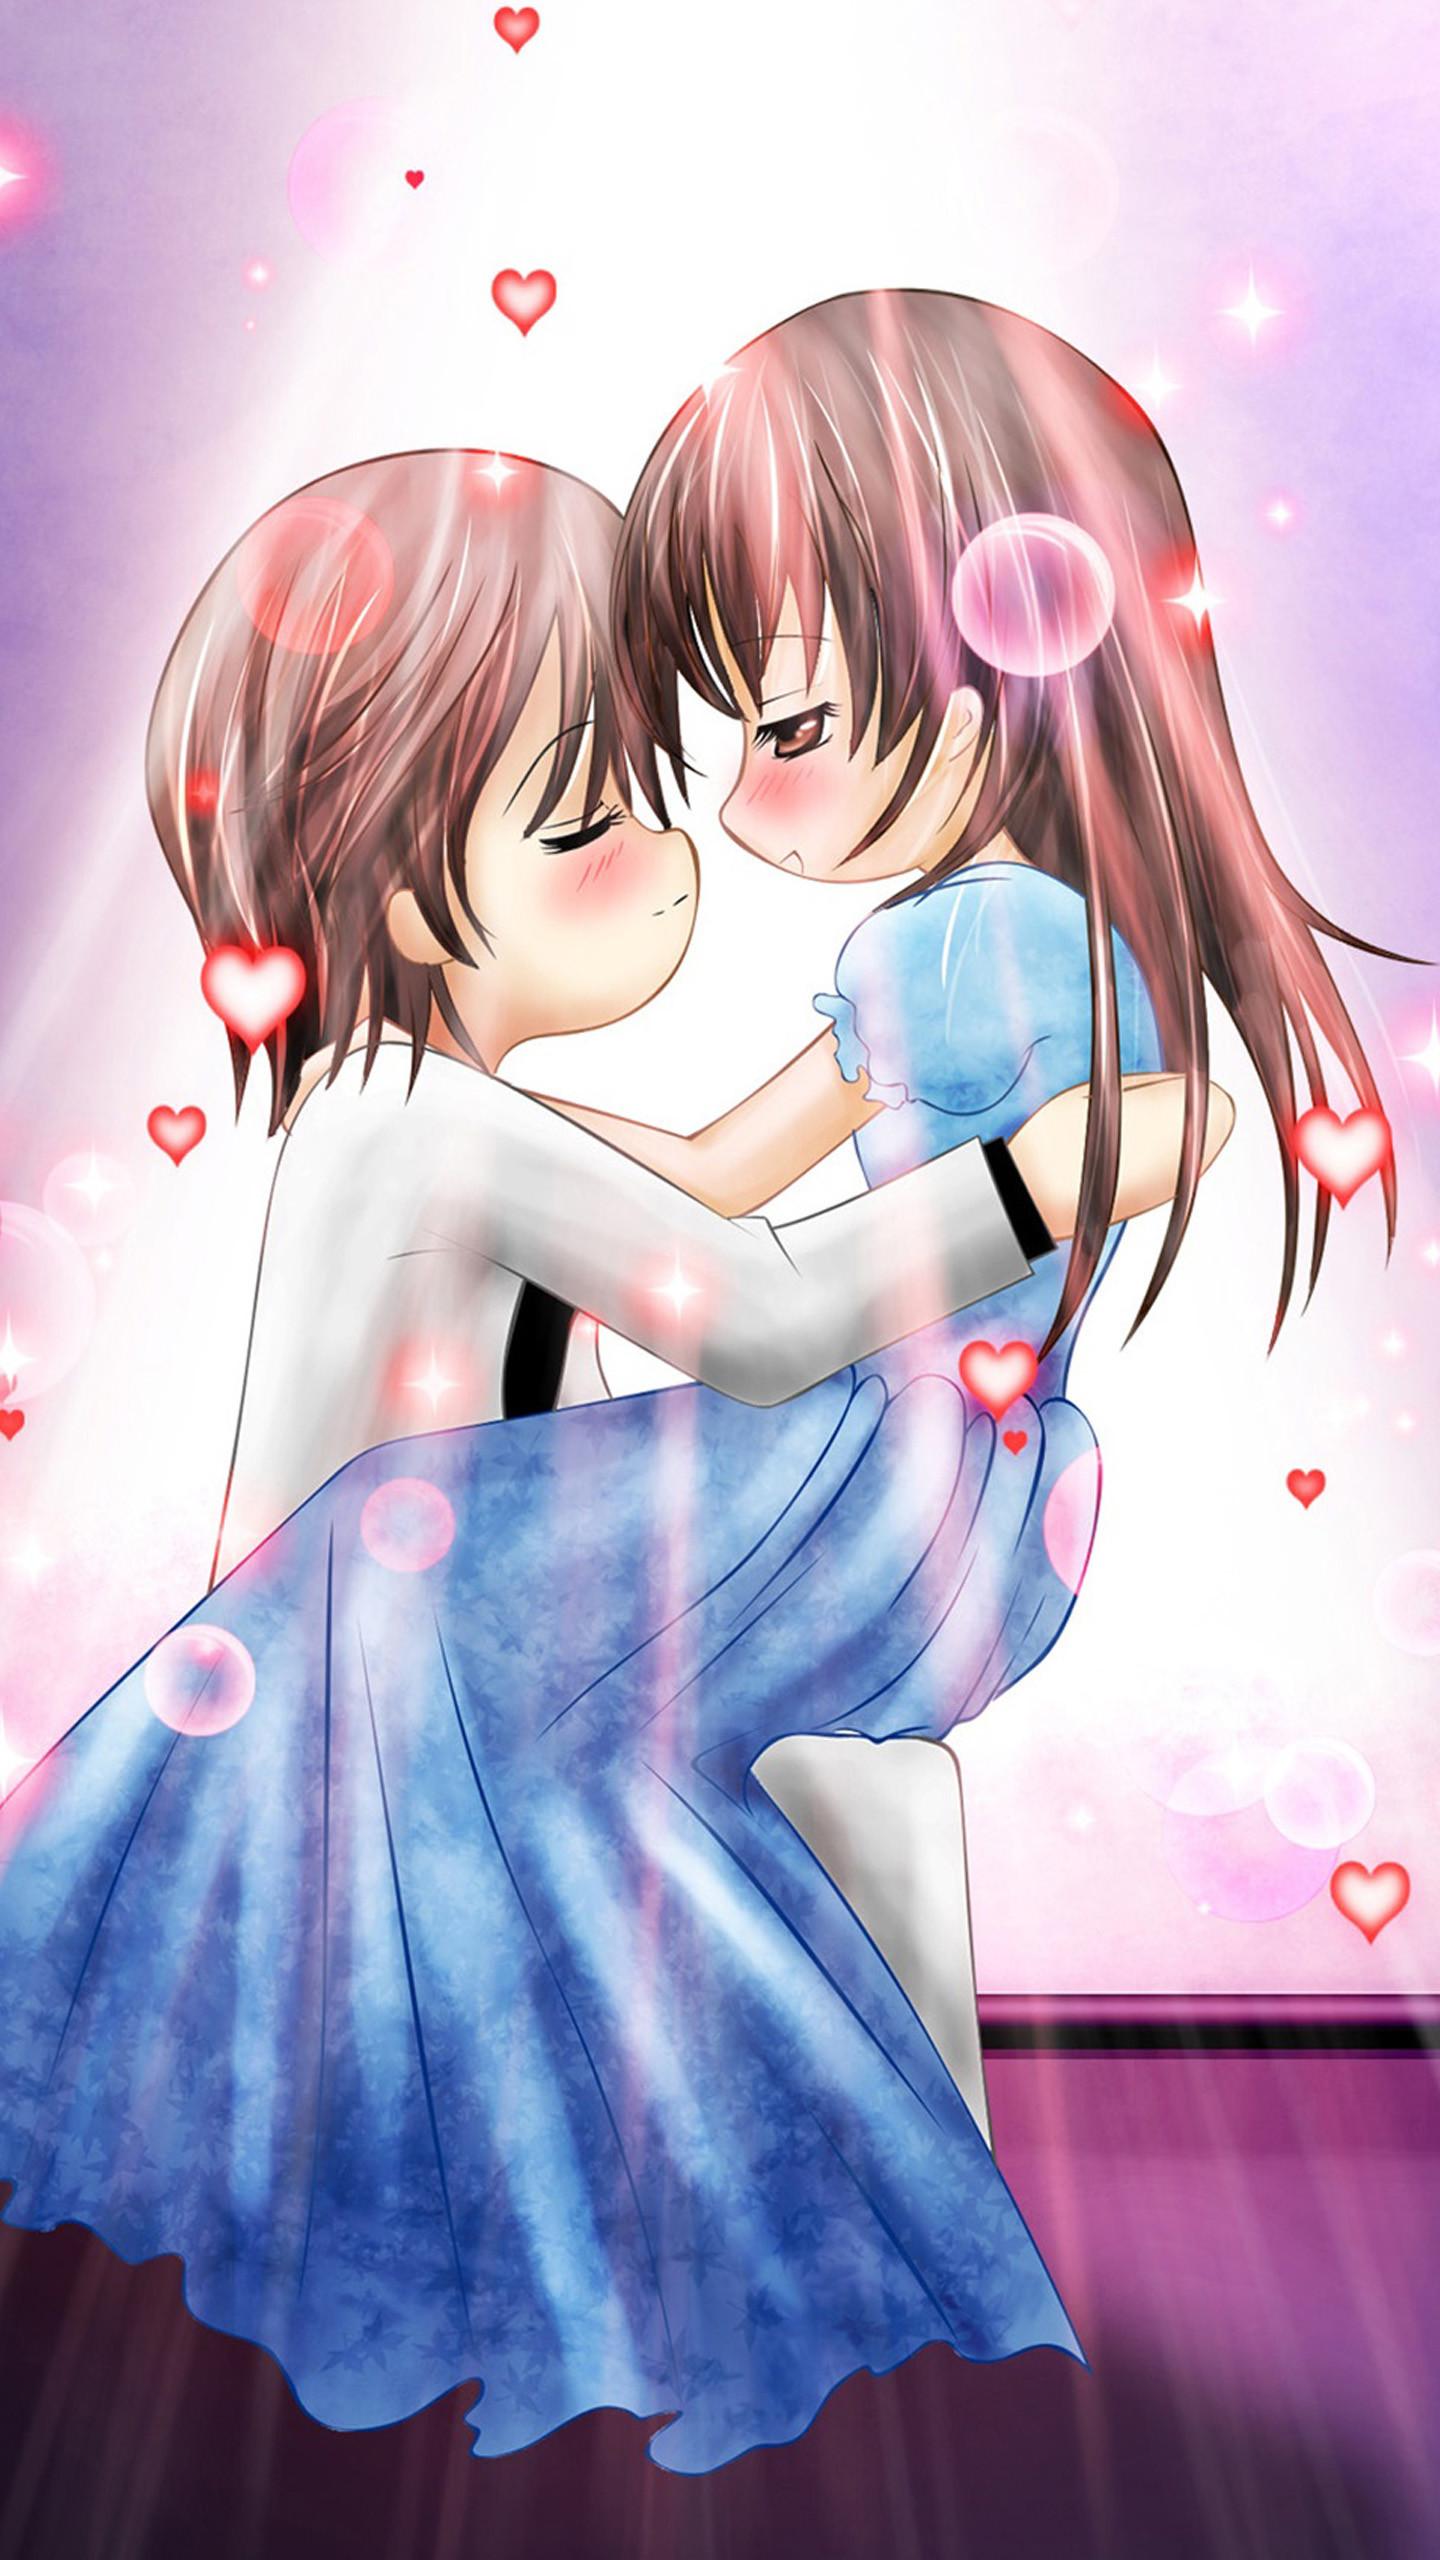 Best Cute Cartoon Love Wallpaper For Iphone - 247041  Image_307056.jpg